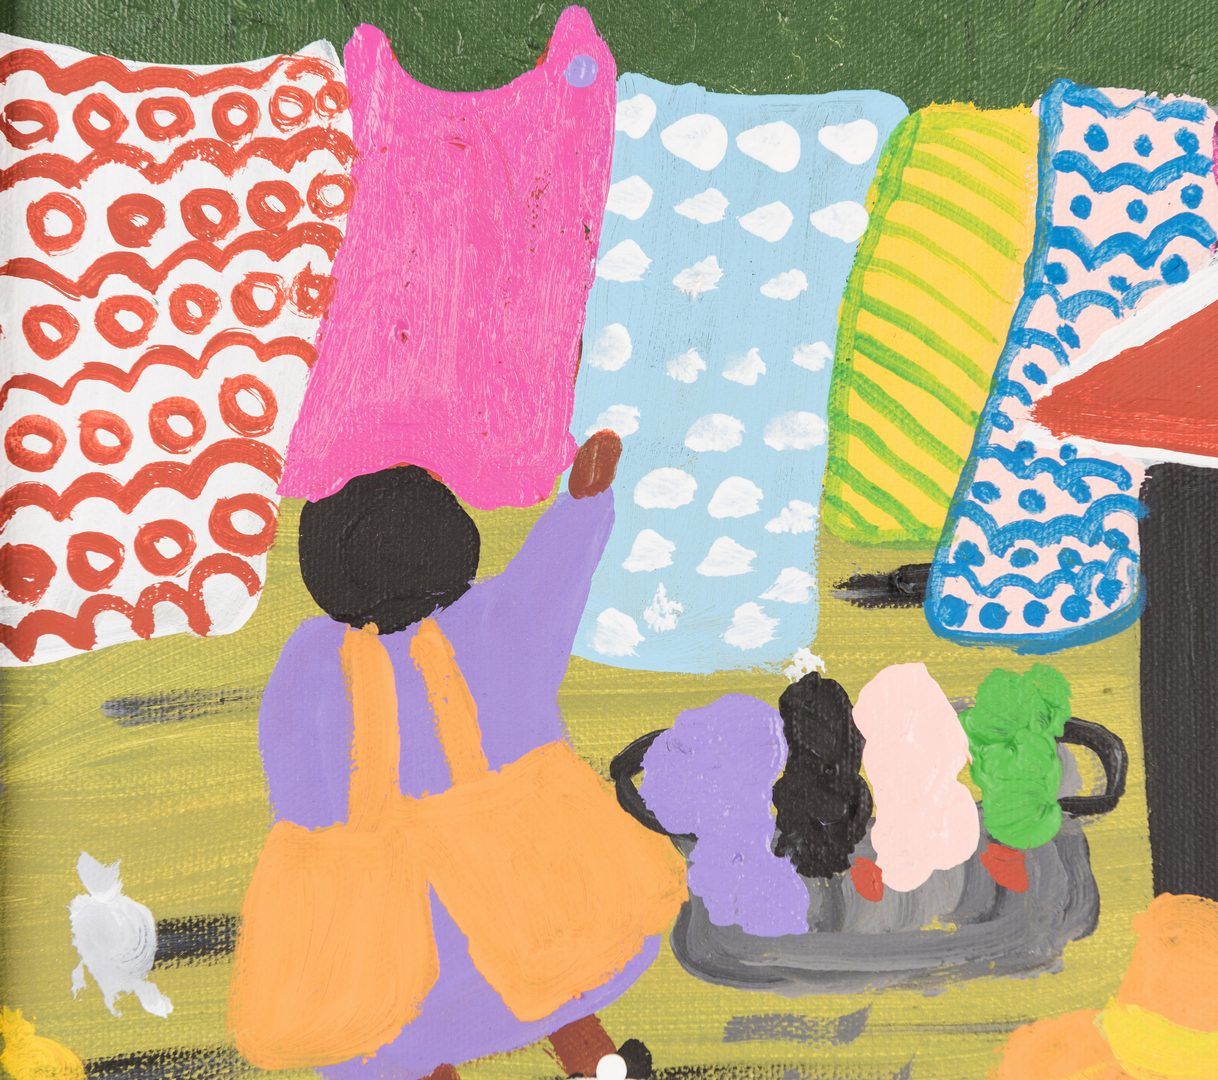 Lot 665: Bernice Sims Outsider Art Painting, Laundry Day